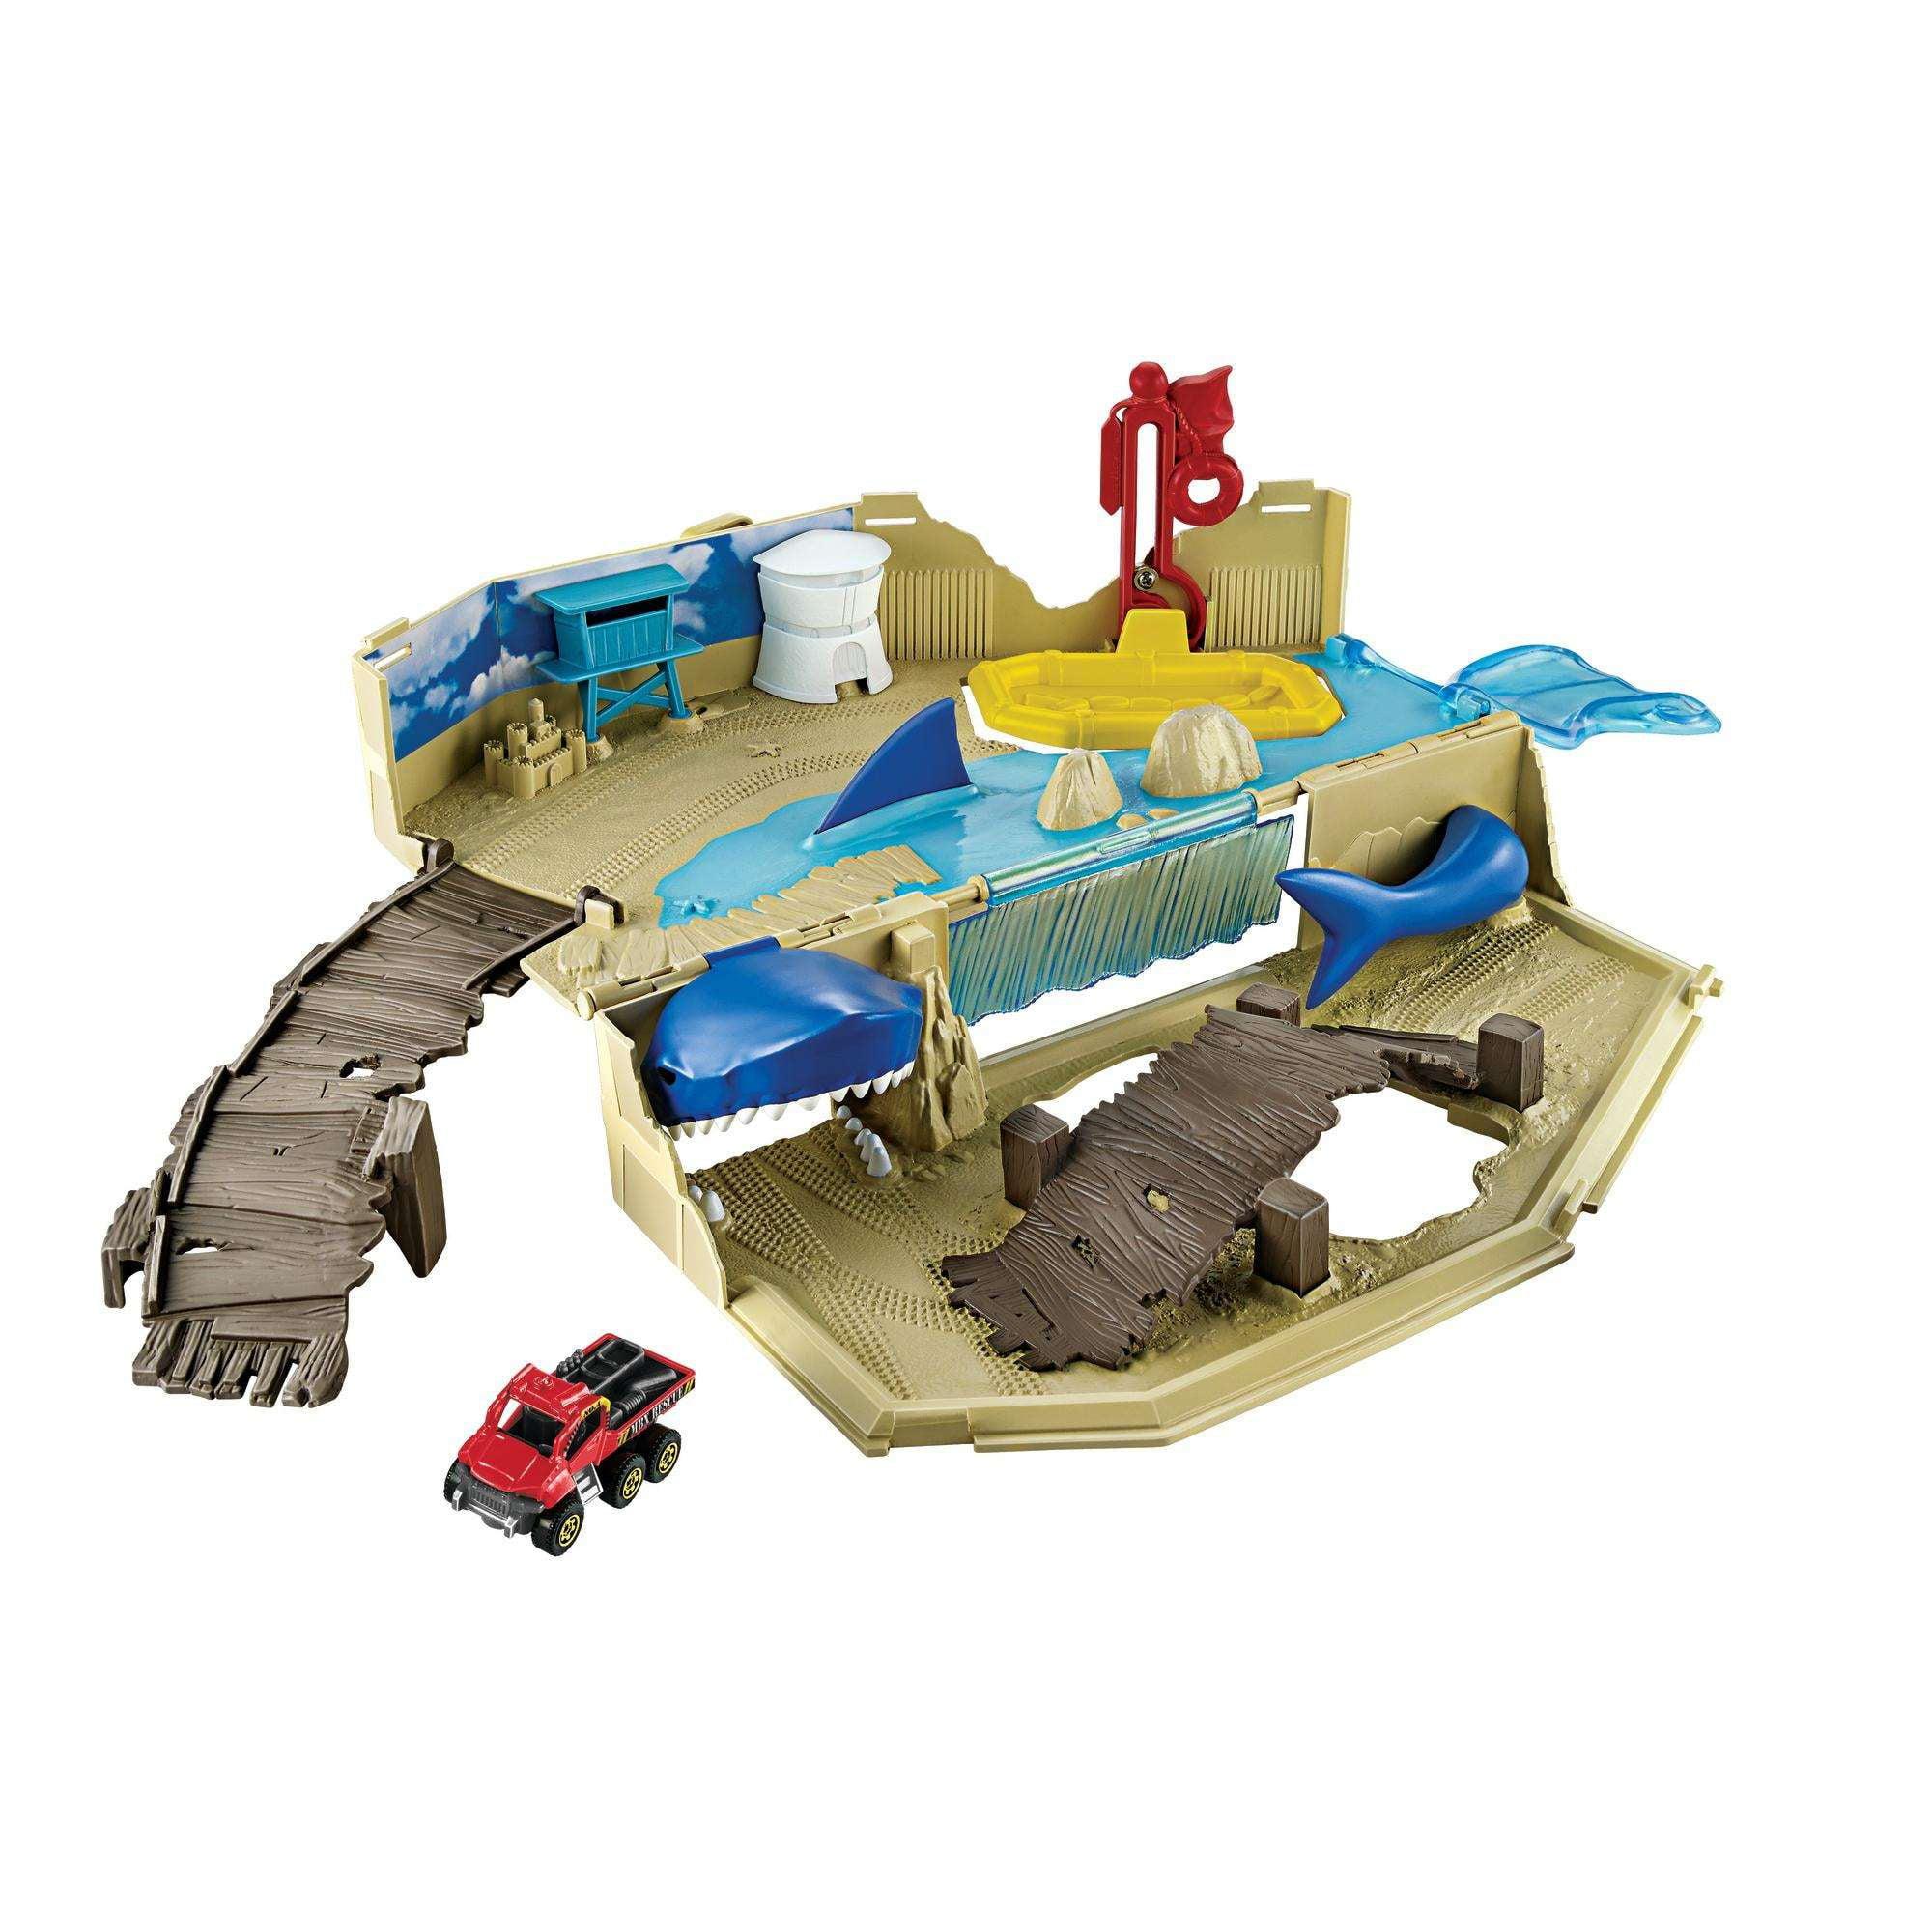 Matchbox Swamp Chomper Play Set by Mattel